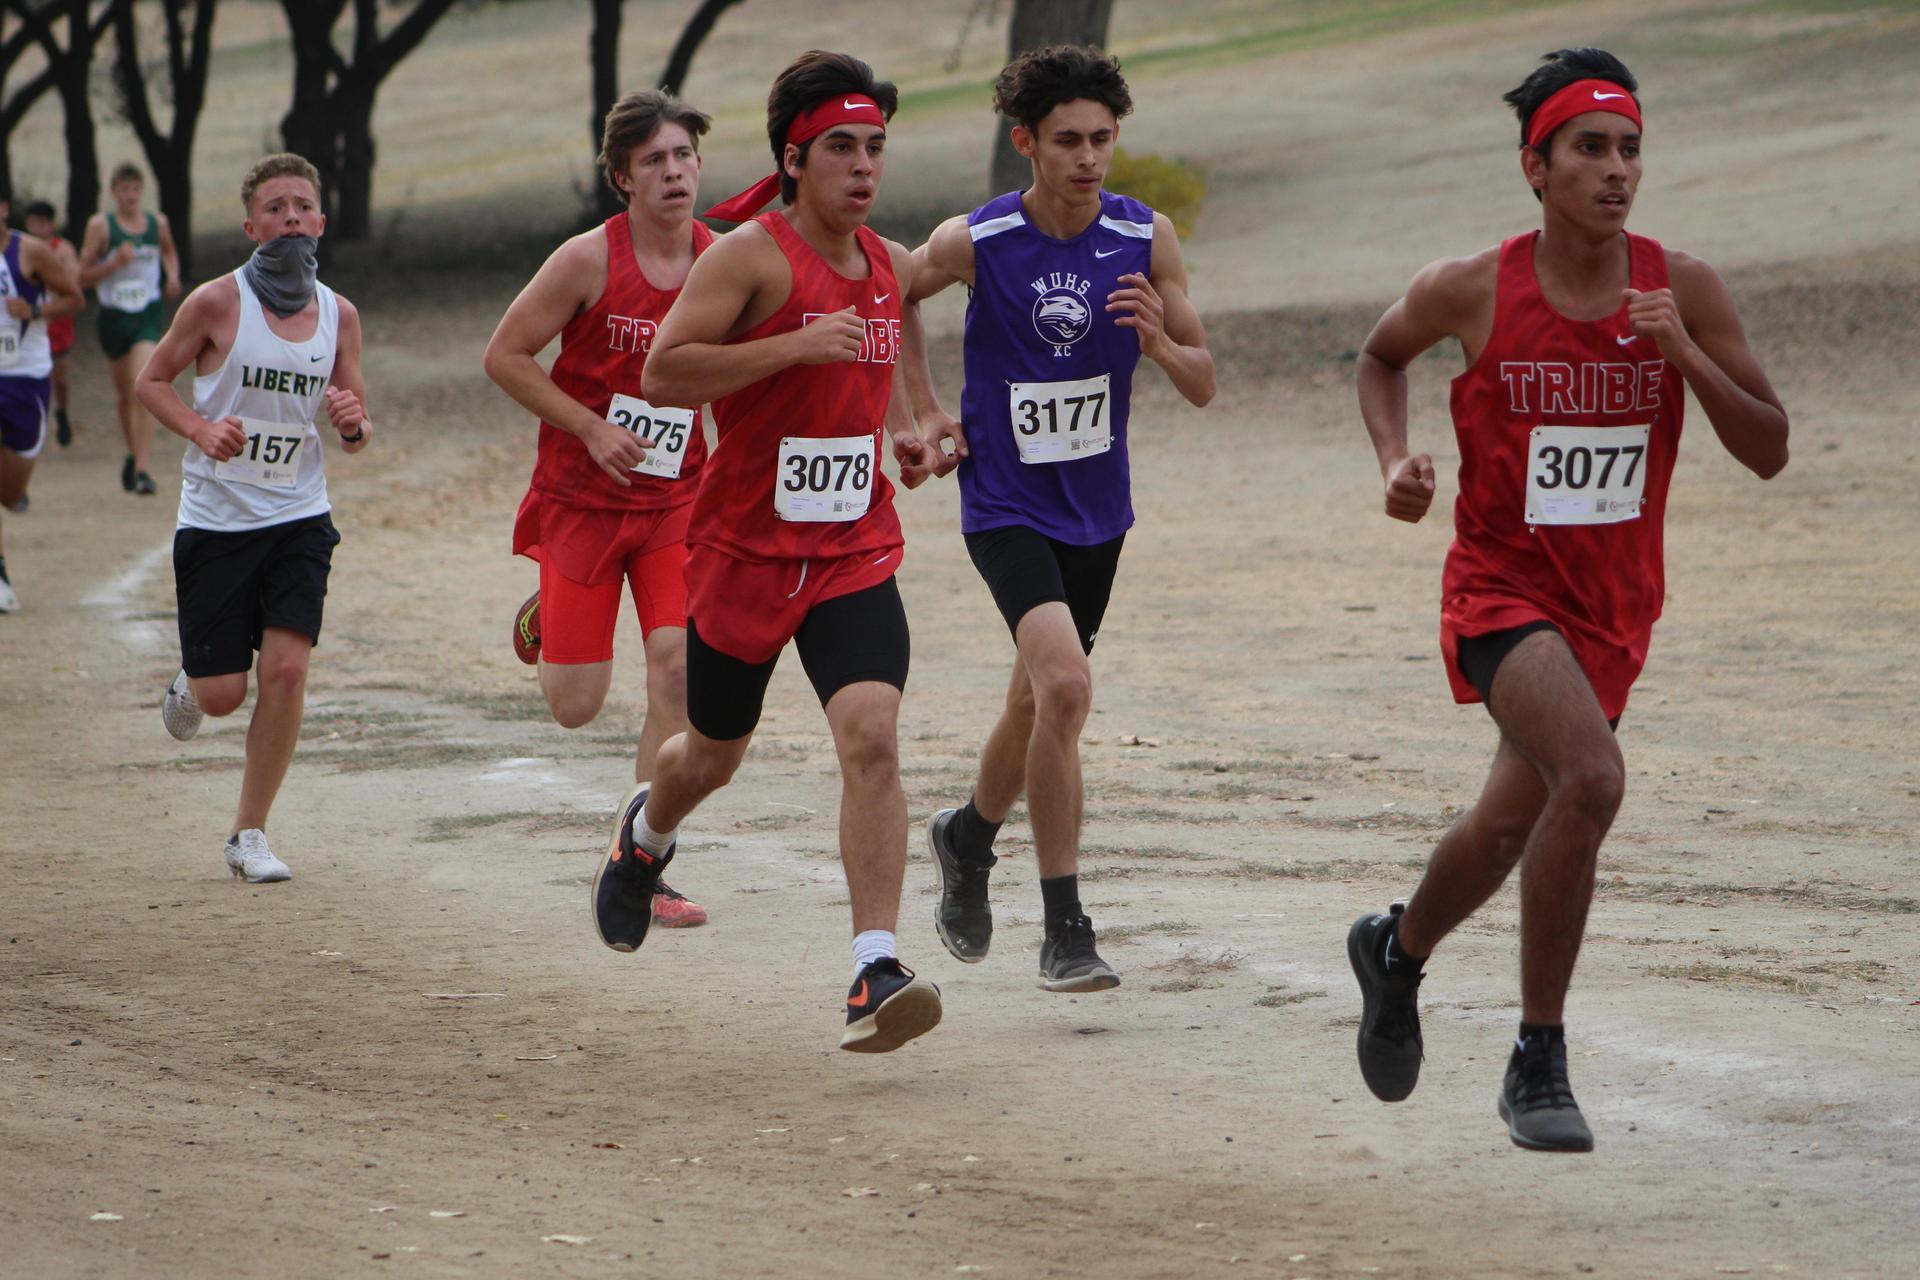 Nicholas Martinez, Nick Upton and Raymond Mendoza racing at woodward park